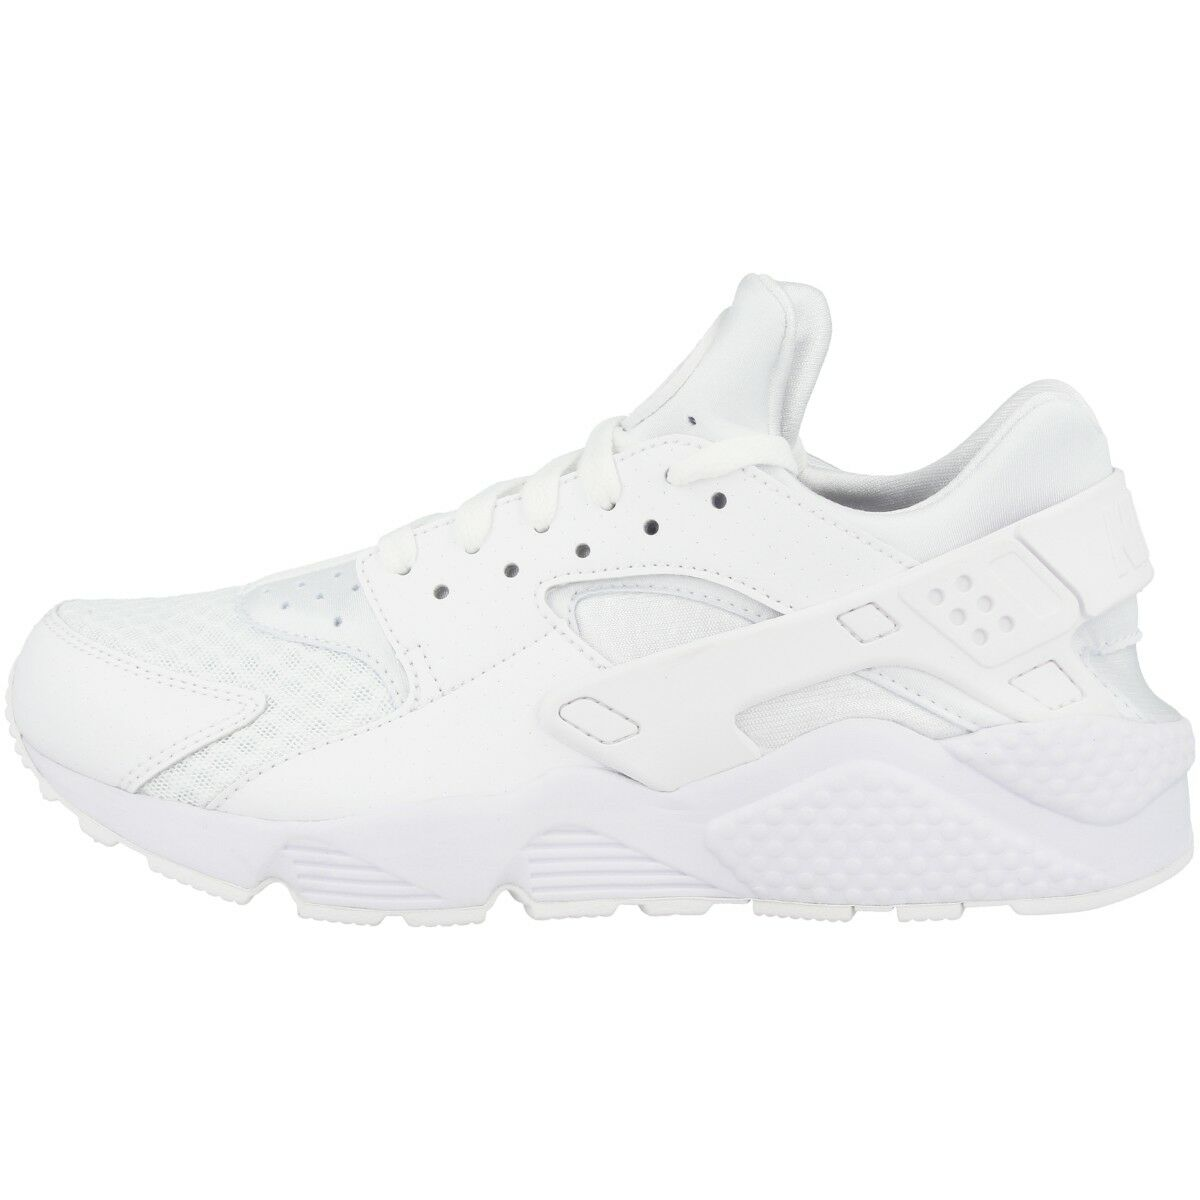 Nike Air Huarache shoes Trainers 318429-111 White Platinum Premium 97 Classic